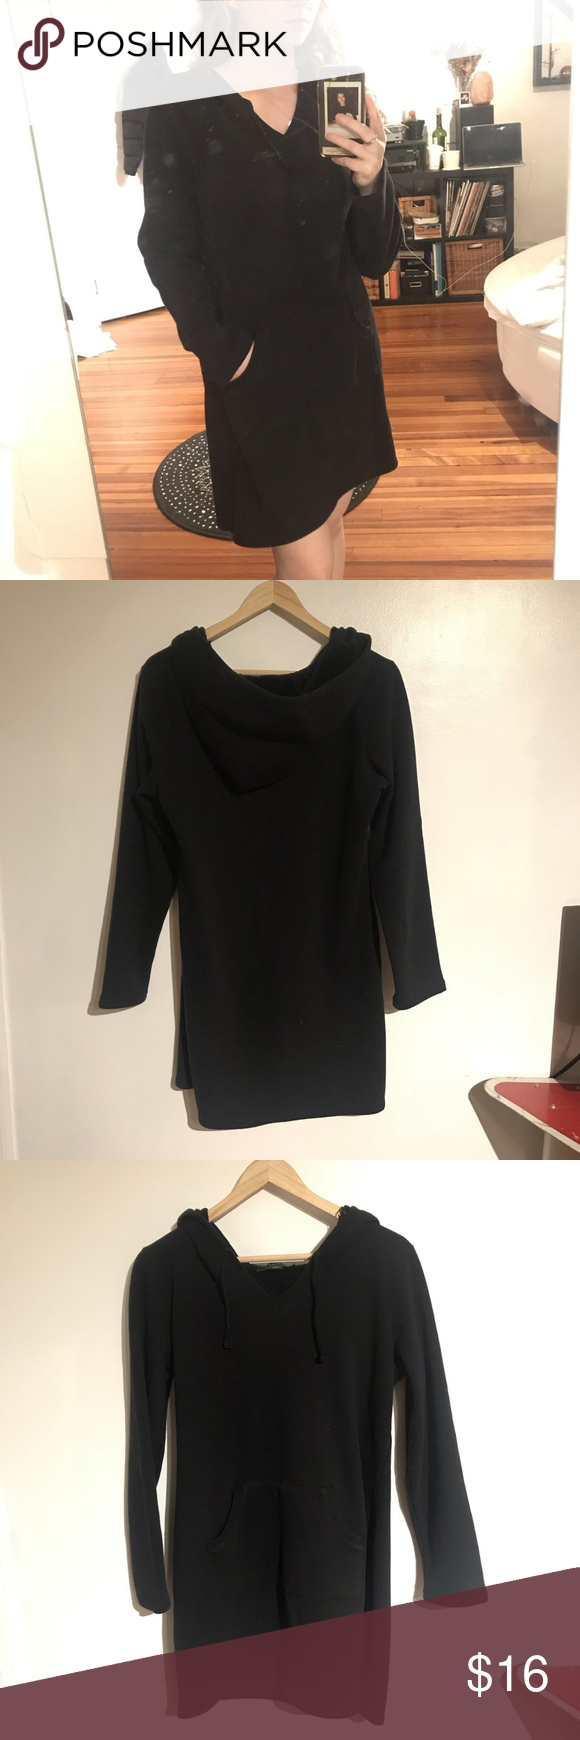 Tahari Black Sweatshirt Dress Black Sweatshirt Dress Sweatshirt Dress Sweatshirts [ 1740 x 580 Pixel ]